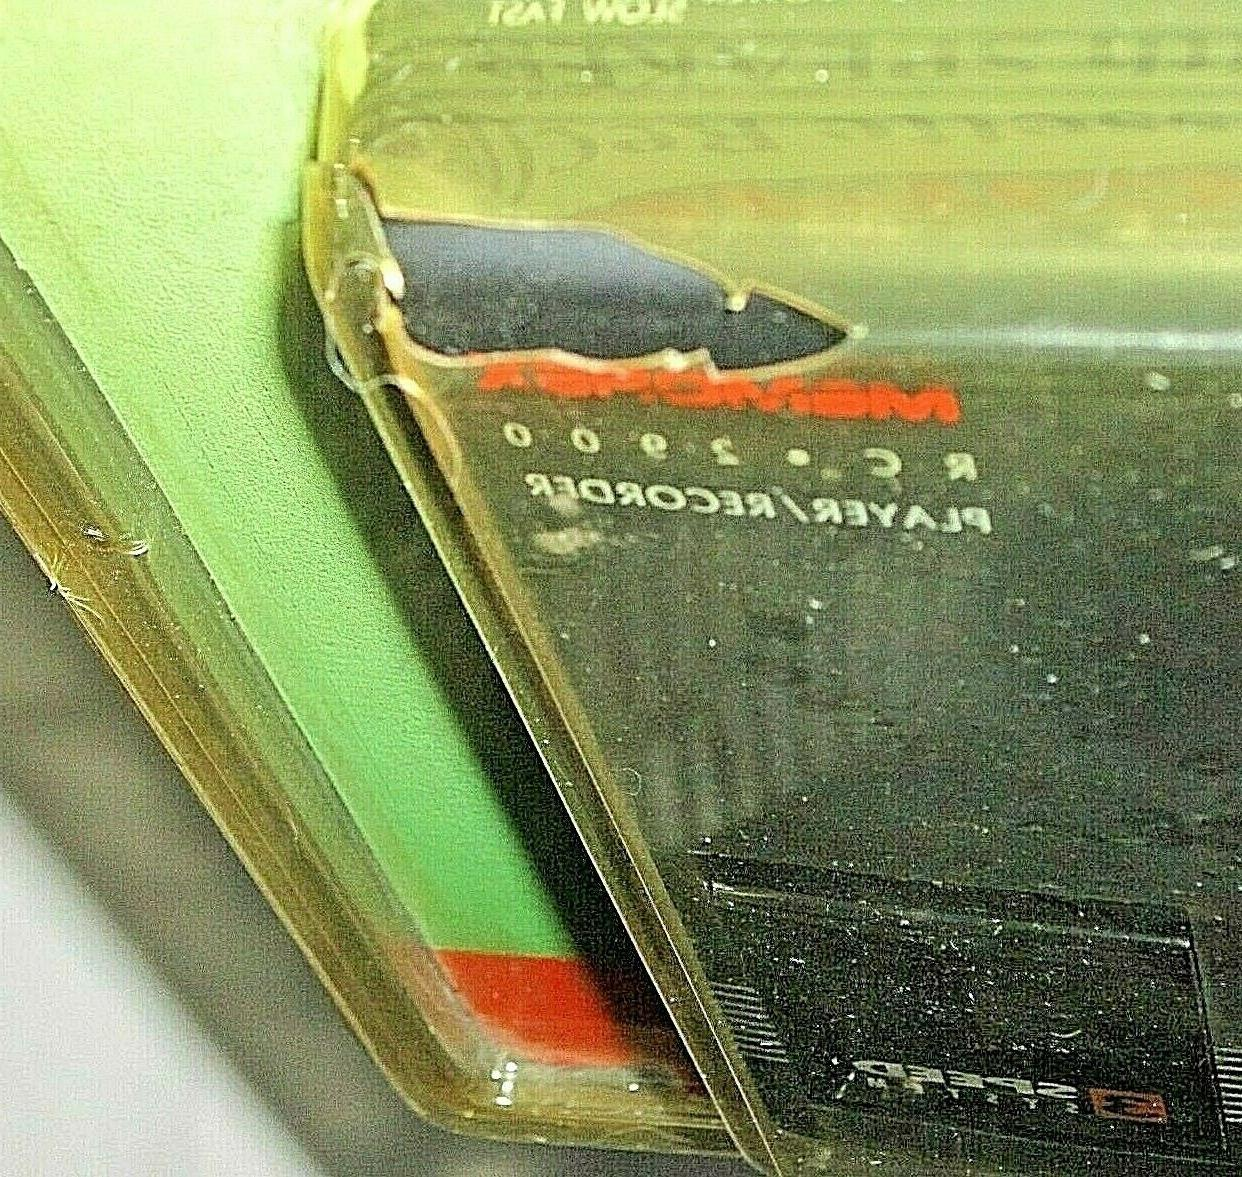 Vintage SEALED 1980'S MEMOREX RC2900 PLAYER w/